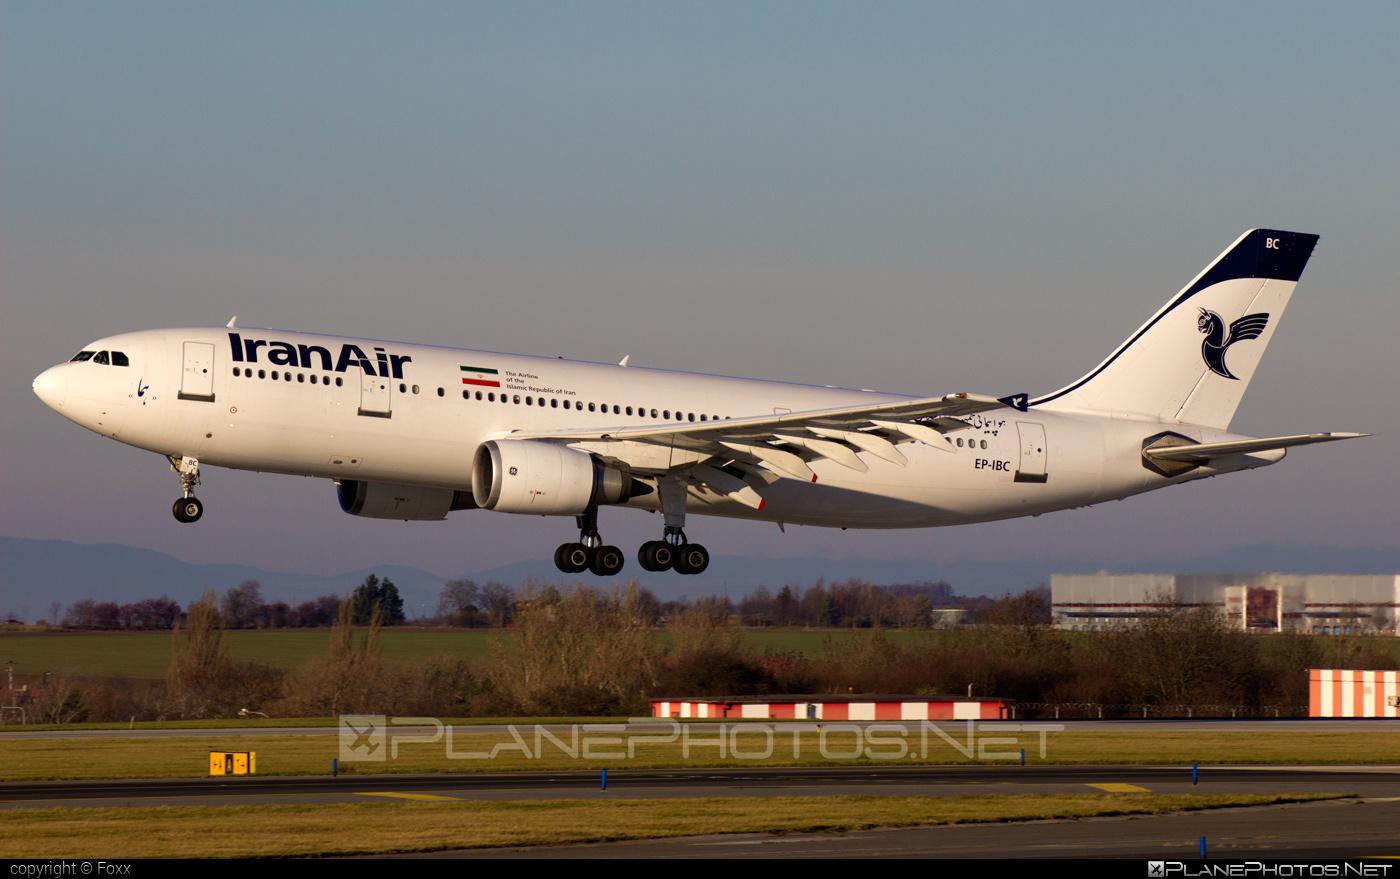 Airbus A300B4-605R - EP-IBC operated by Iran Air #a300 #airbus